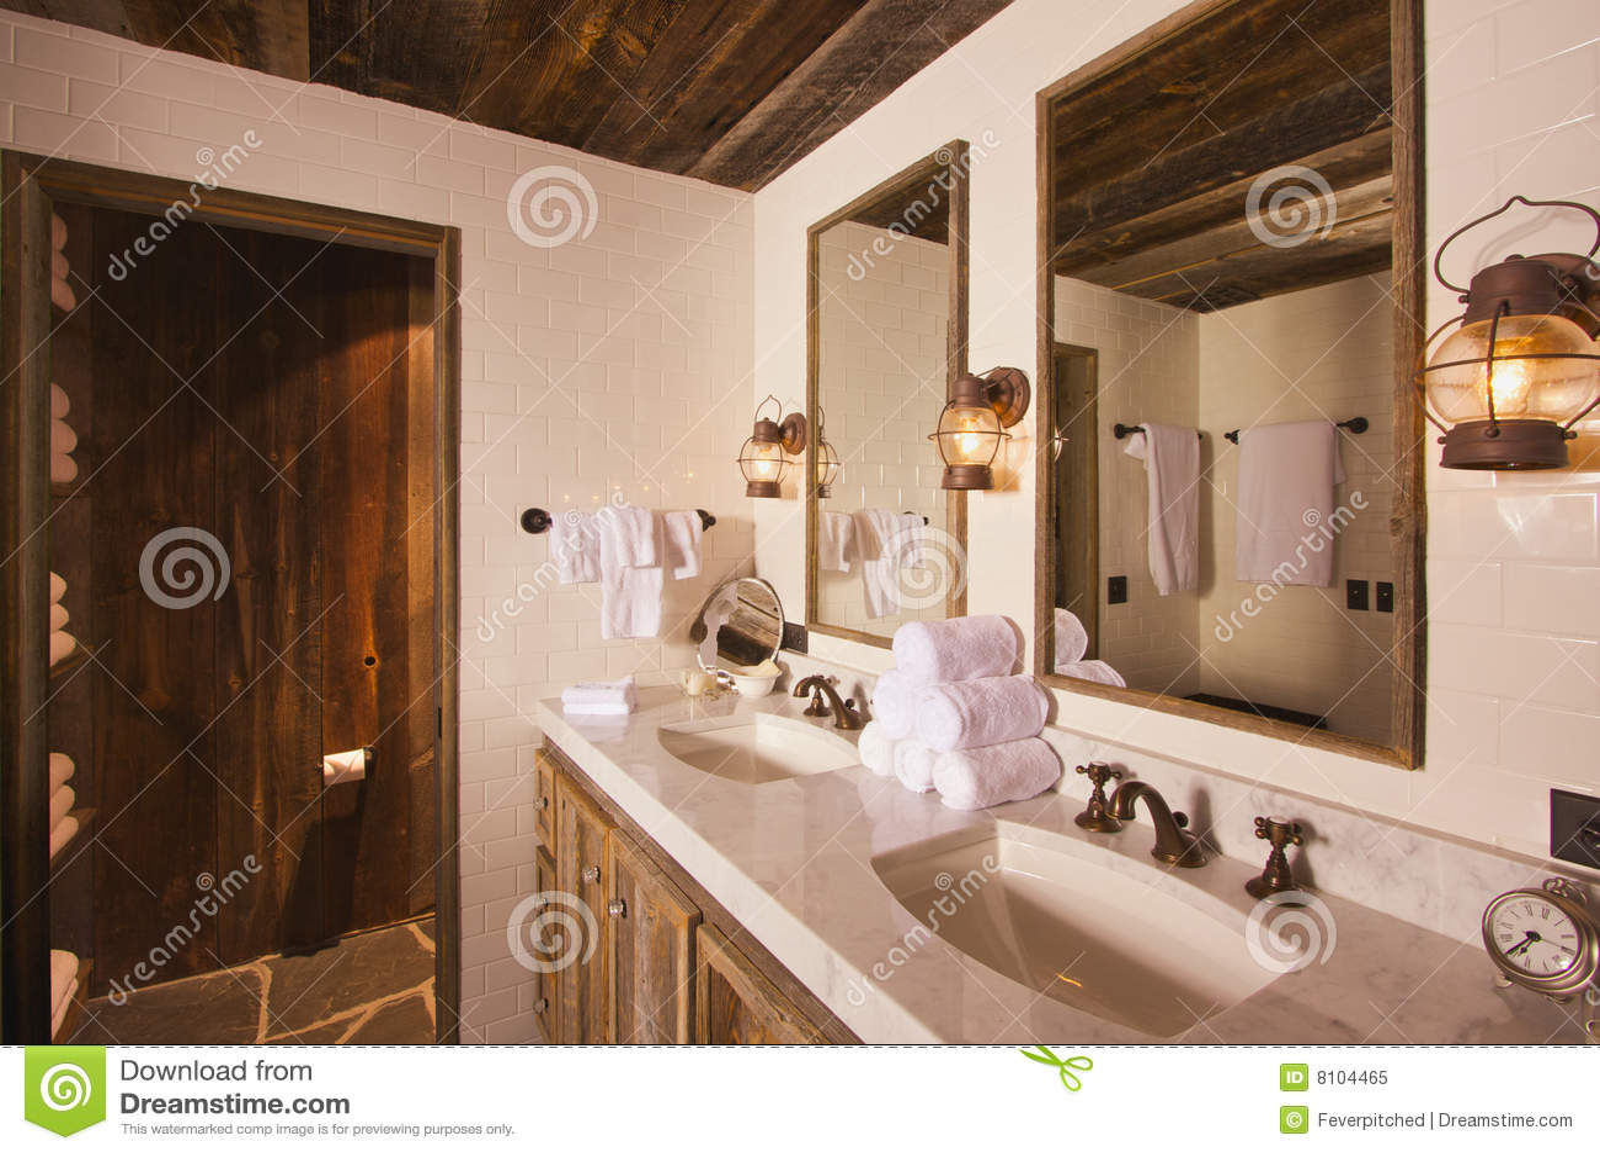 Rustikales badezimmer stockbild bild von raum wanne - Rustikales badezimmer ...